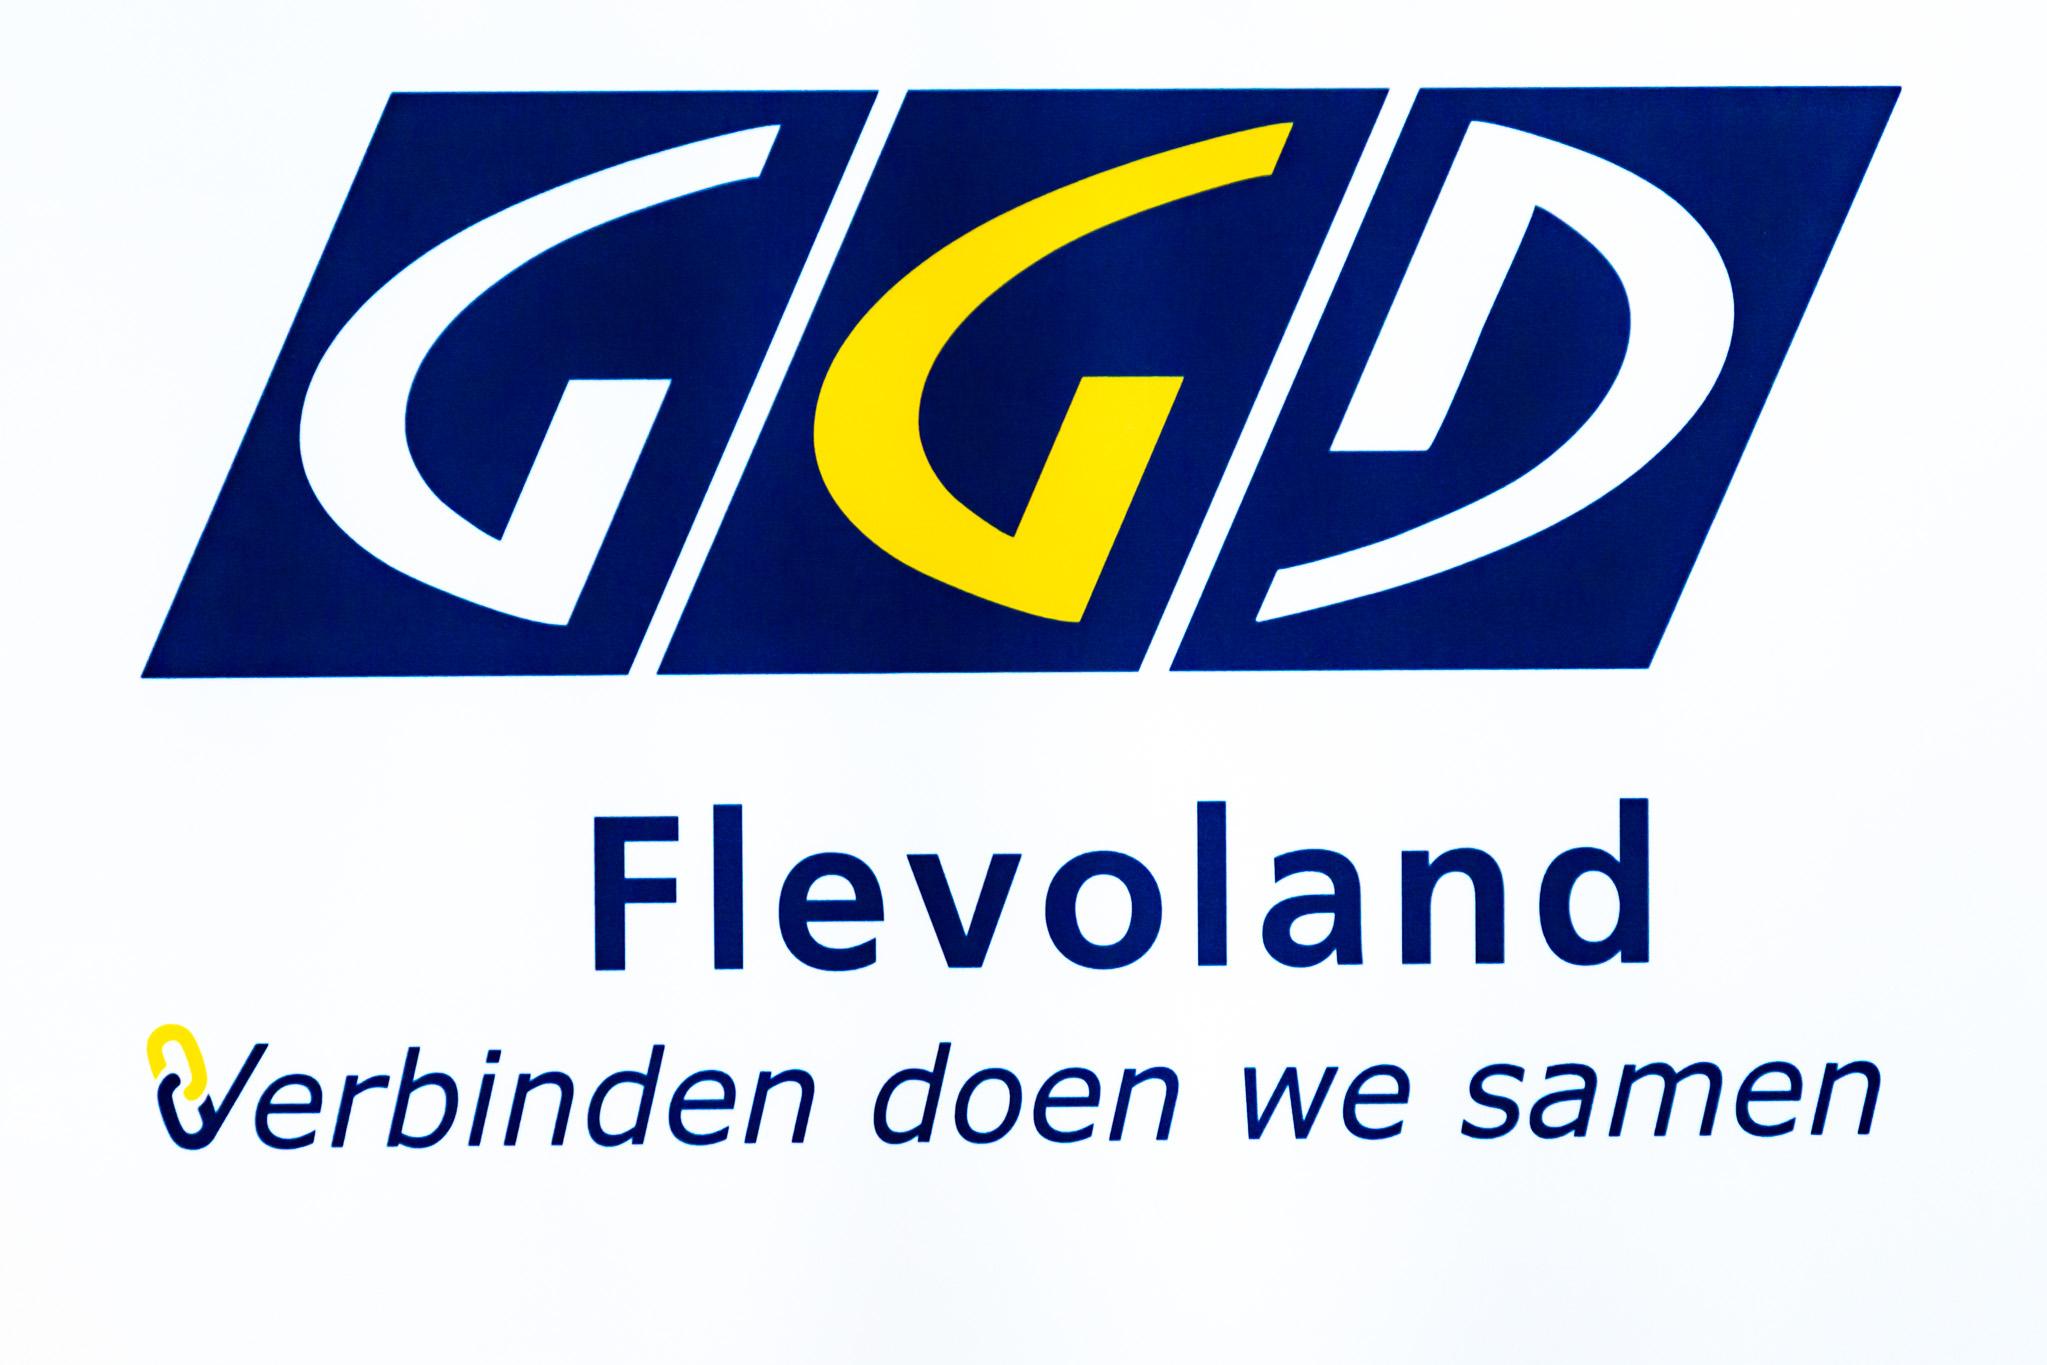 Bedrijf Reportage Positieve Gezondheid Flevoland Shot By Sylla 11